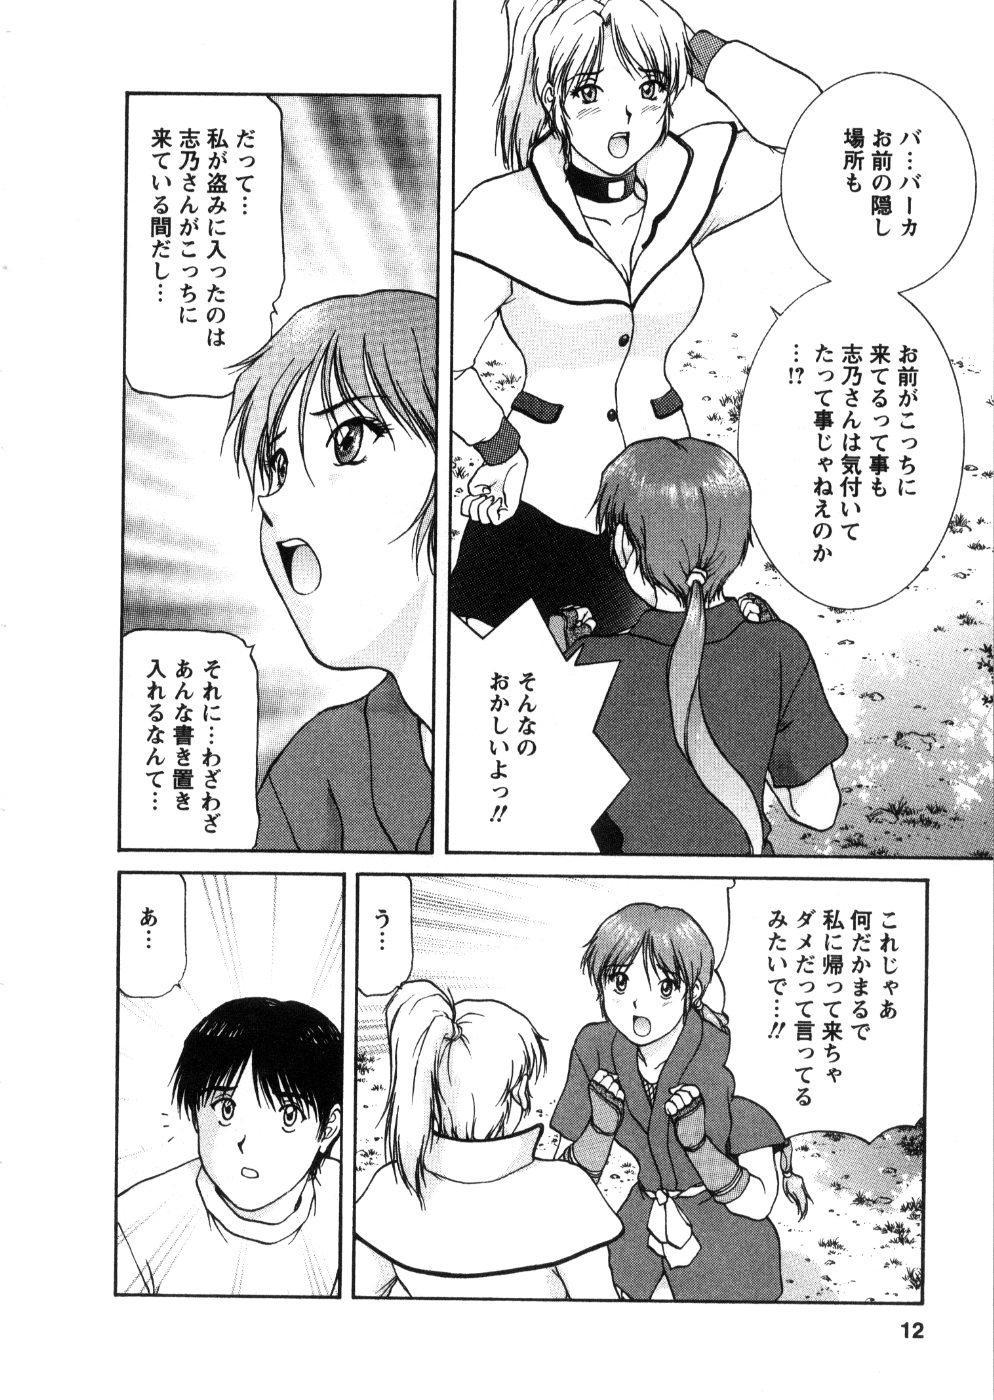 Oneechan-tachi ga Yatte Kuru 03 13